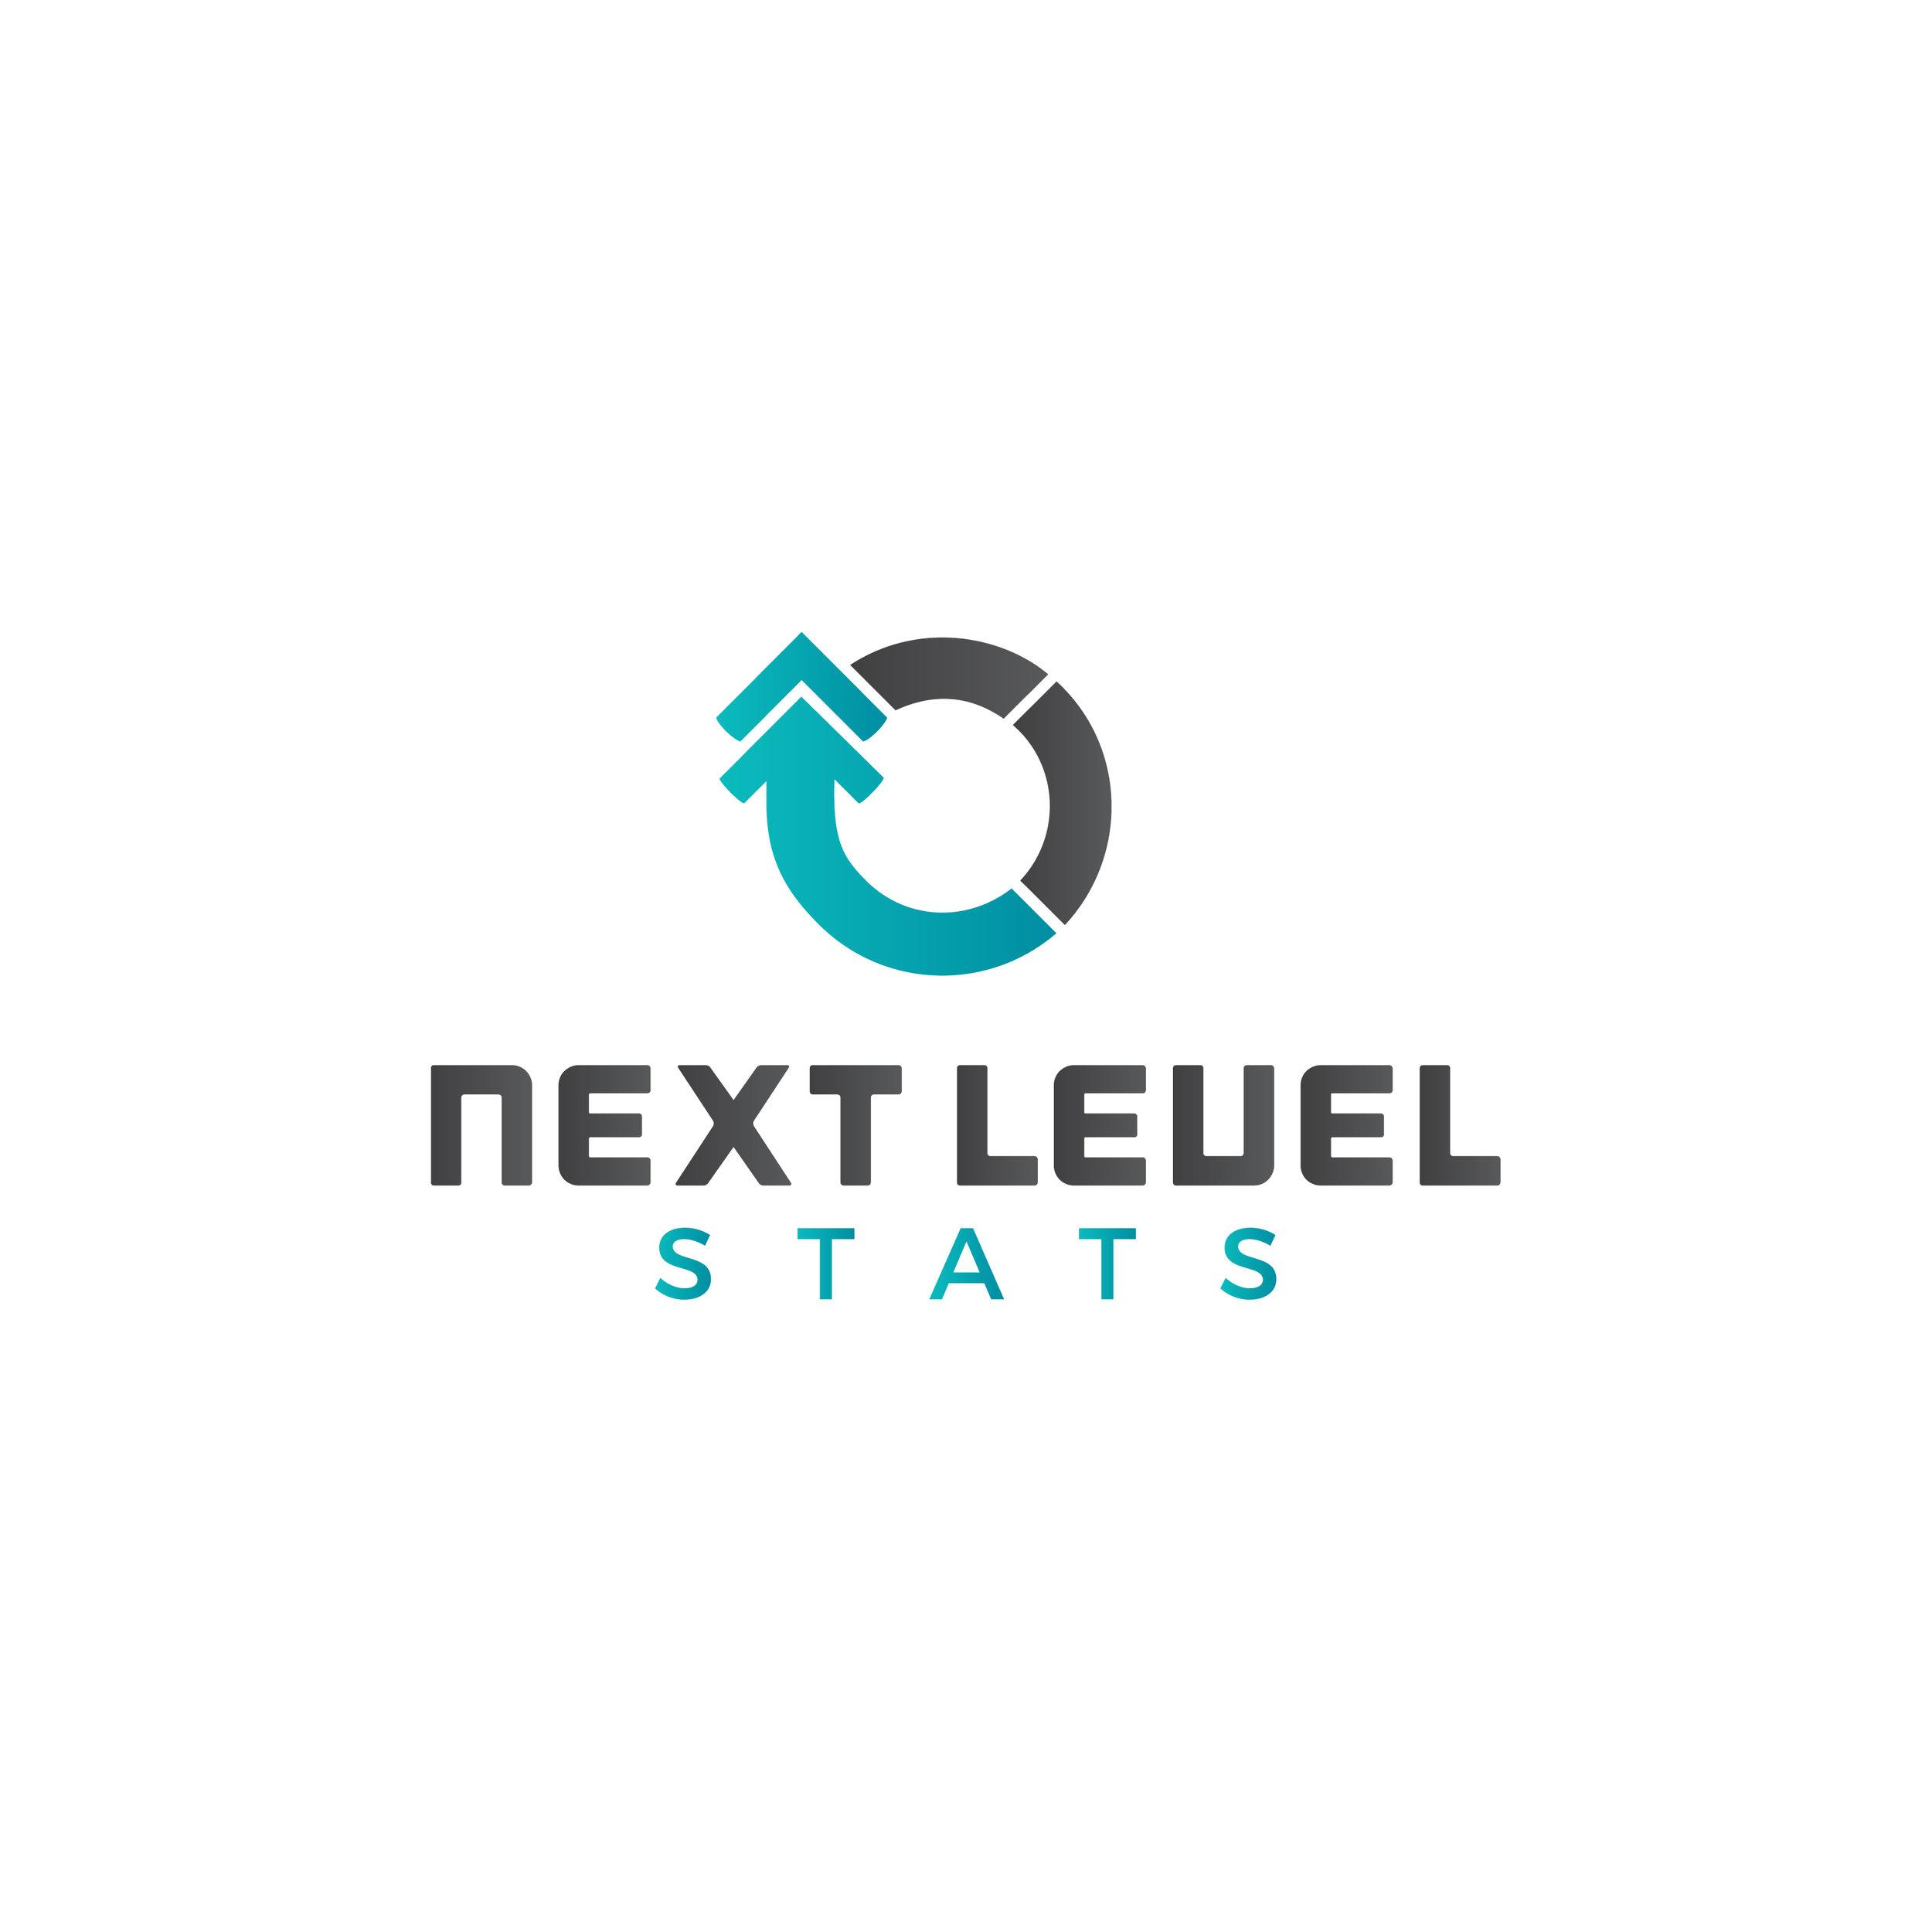 Next Level Stats.jpg